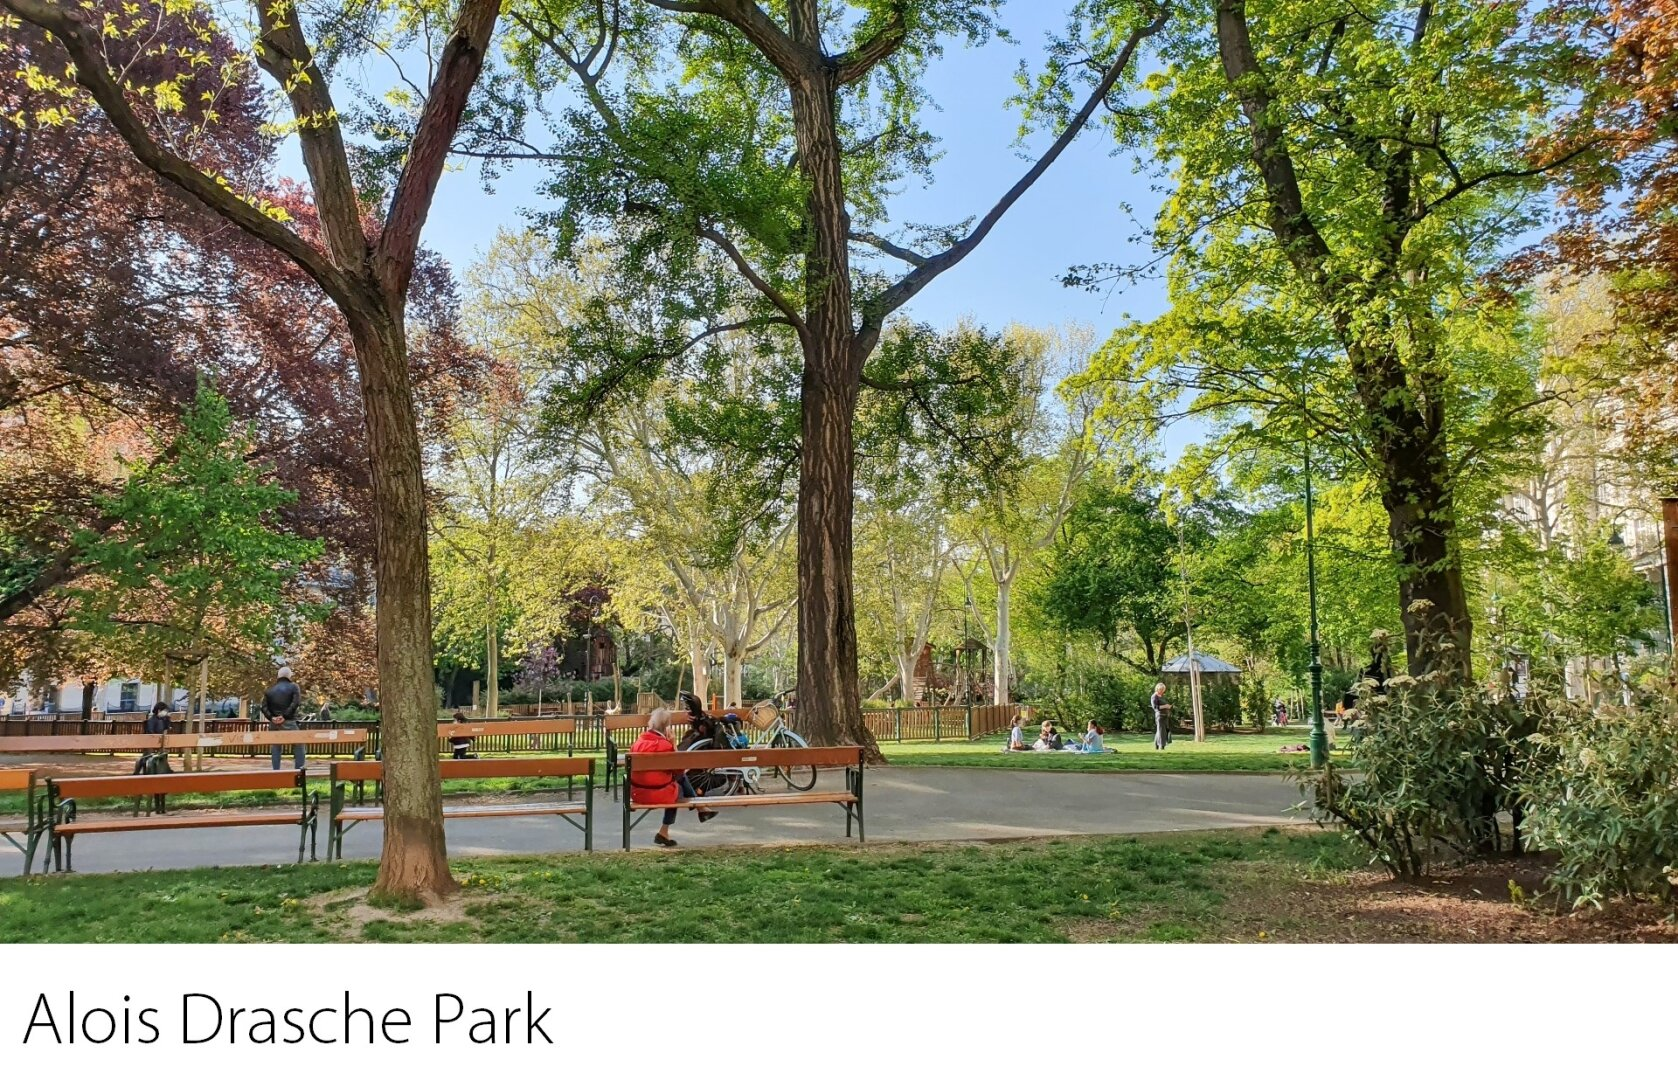 Alois-Drasche-Park